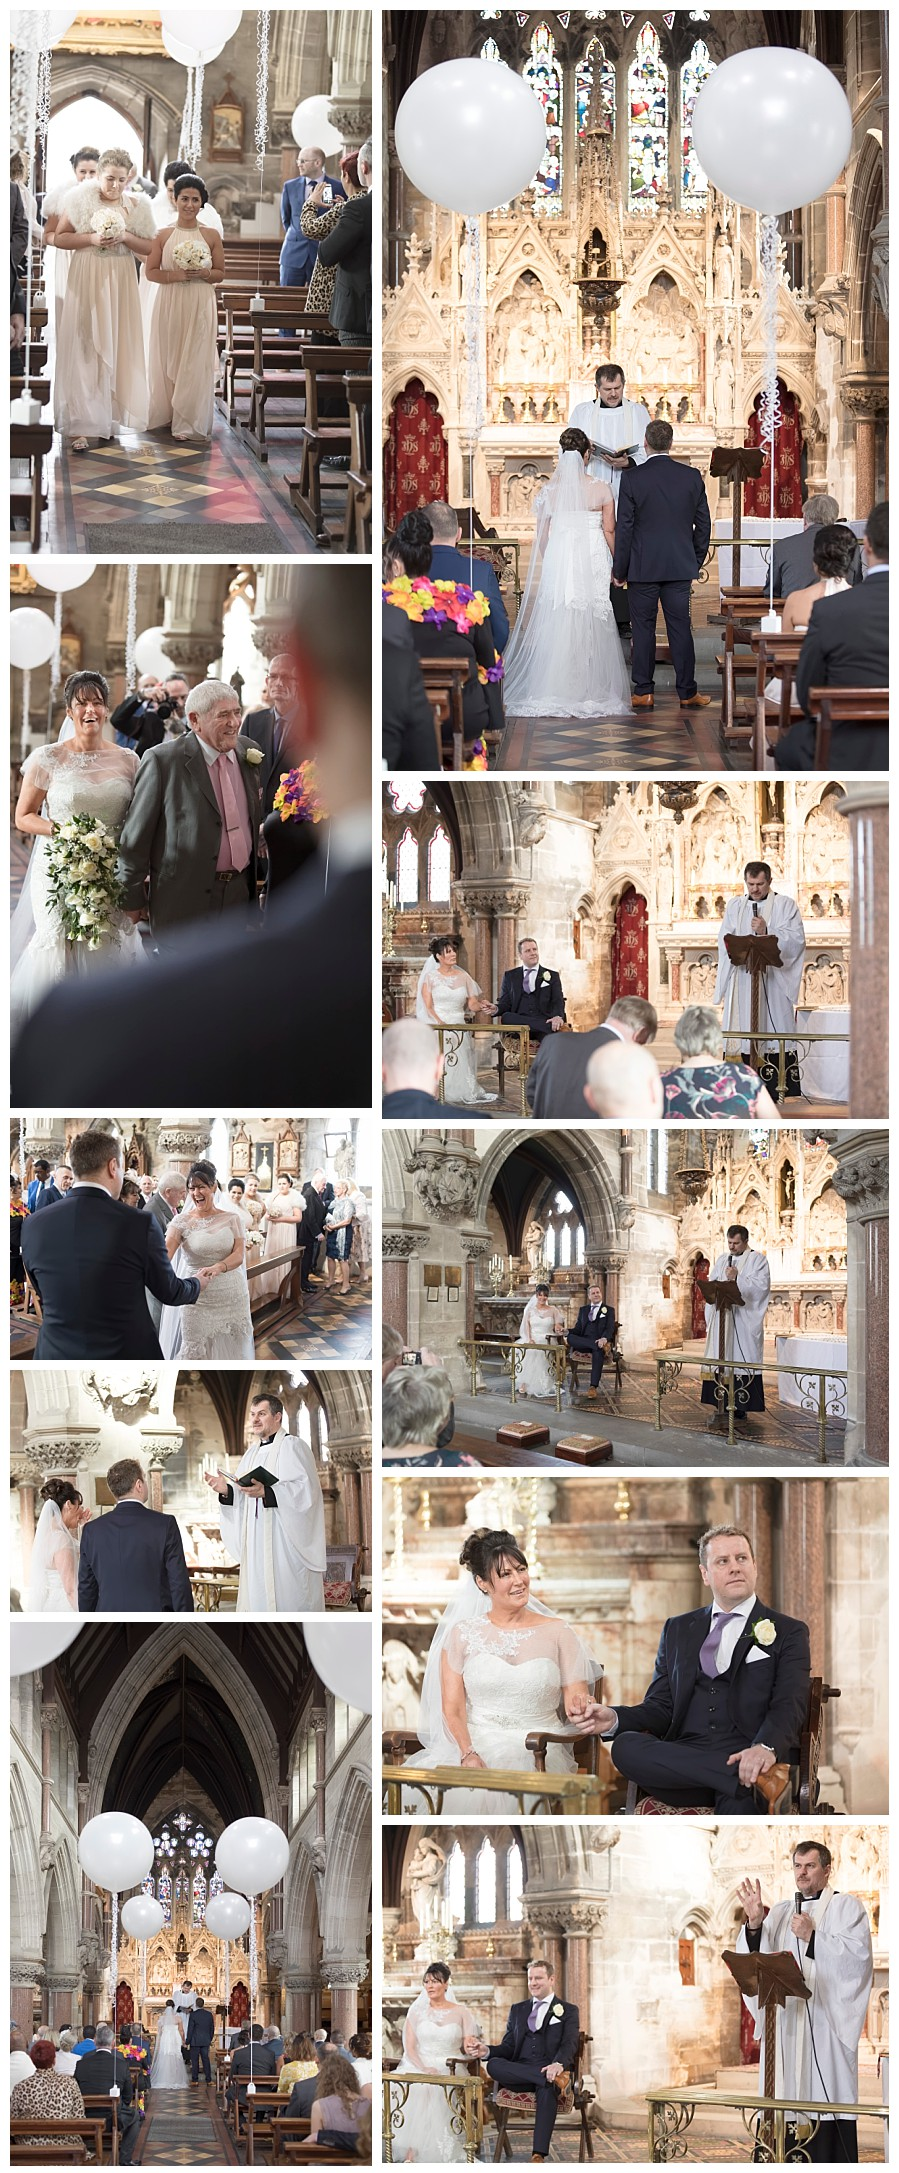 wedding photography Rudding Park Harrogate, weddings at Rudding park chapel, inside church at rudding park hotel, church wedding rudding park